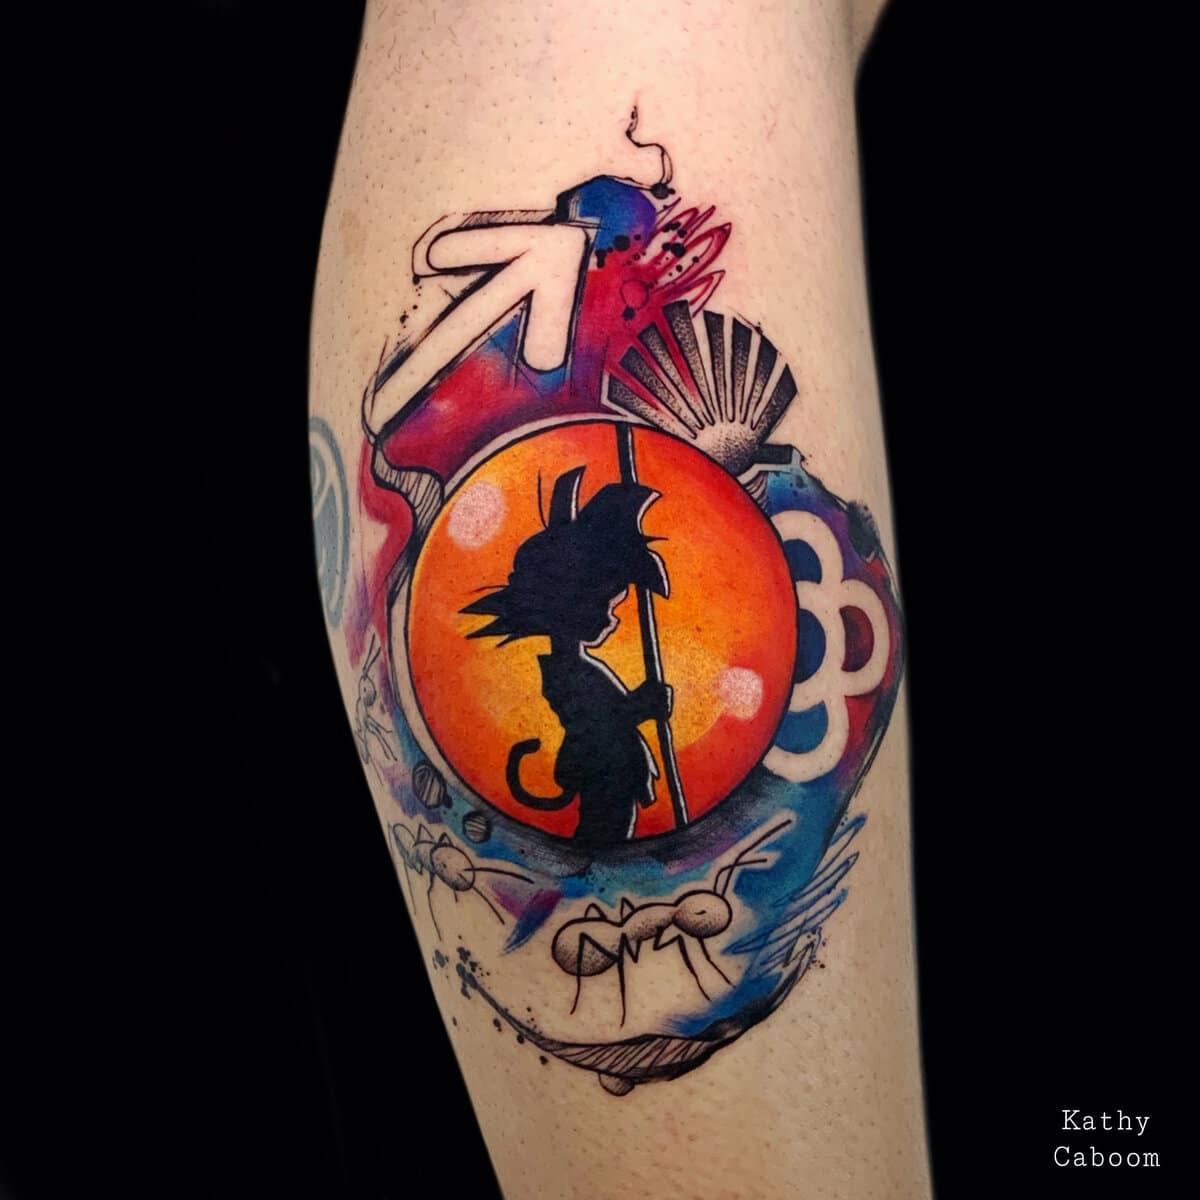 kathycaboom-tattoo-artist-dragon-ball